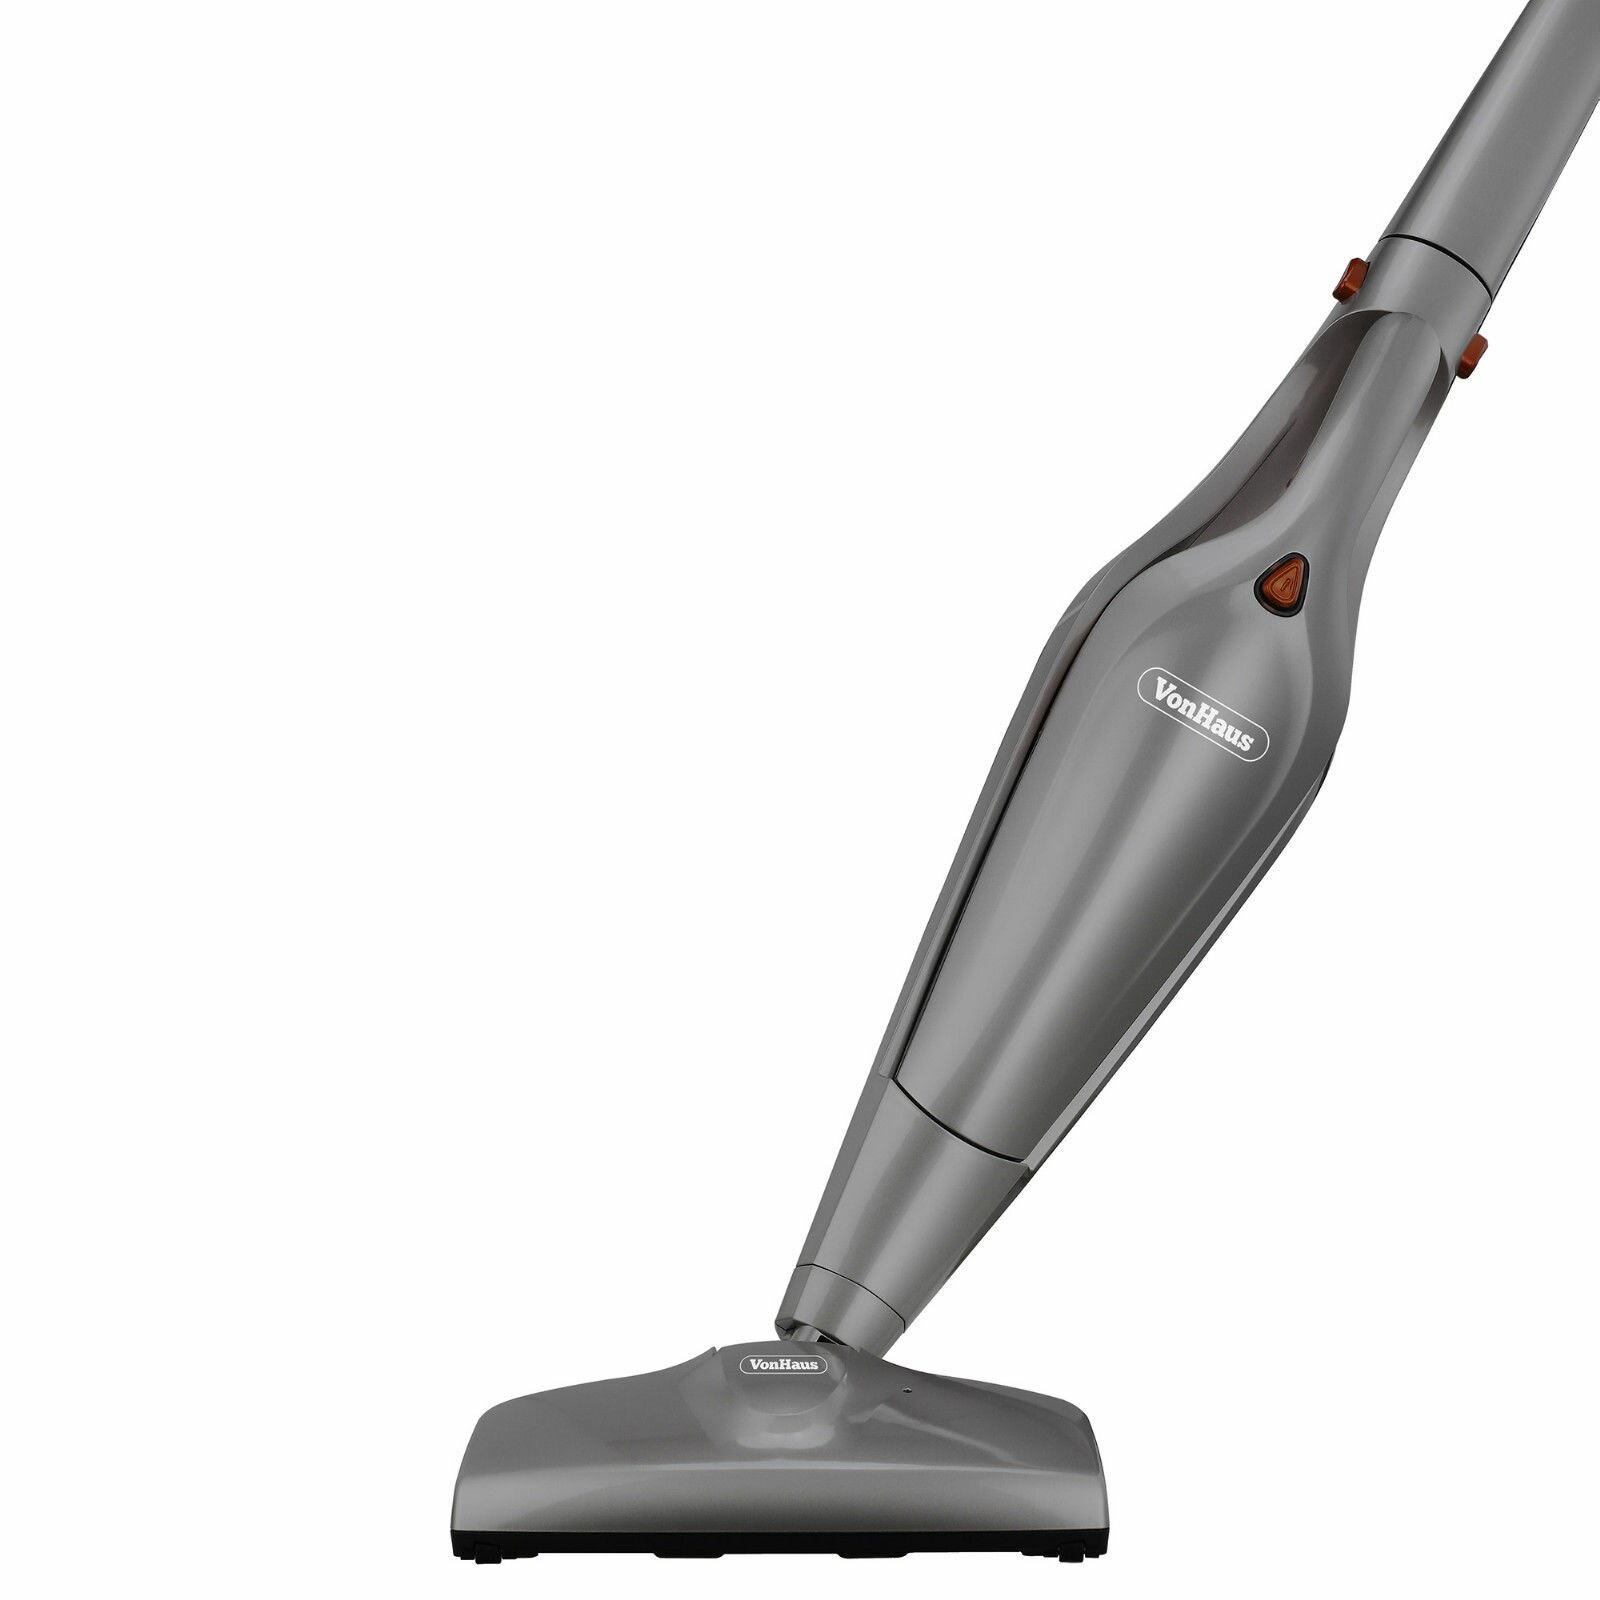 Vonhaus 2 In 1 Cordless Vacuum Cleaner Amp Reviews Wayfair